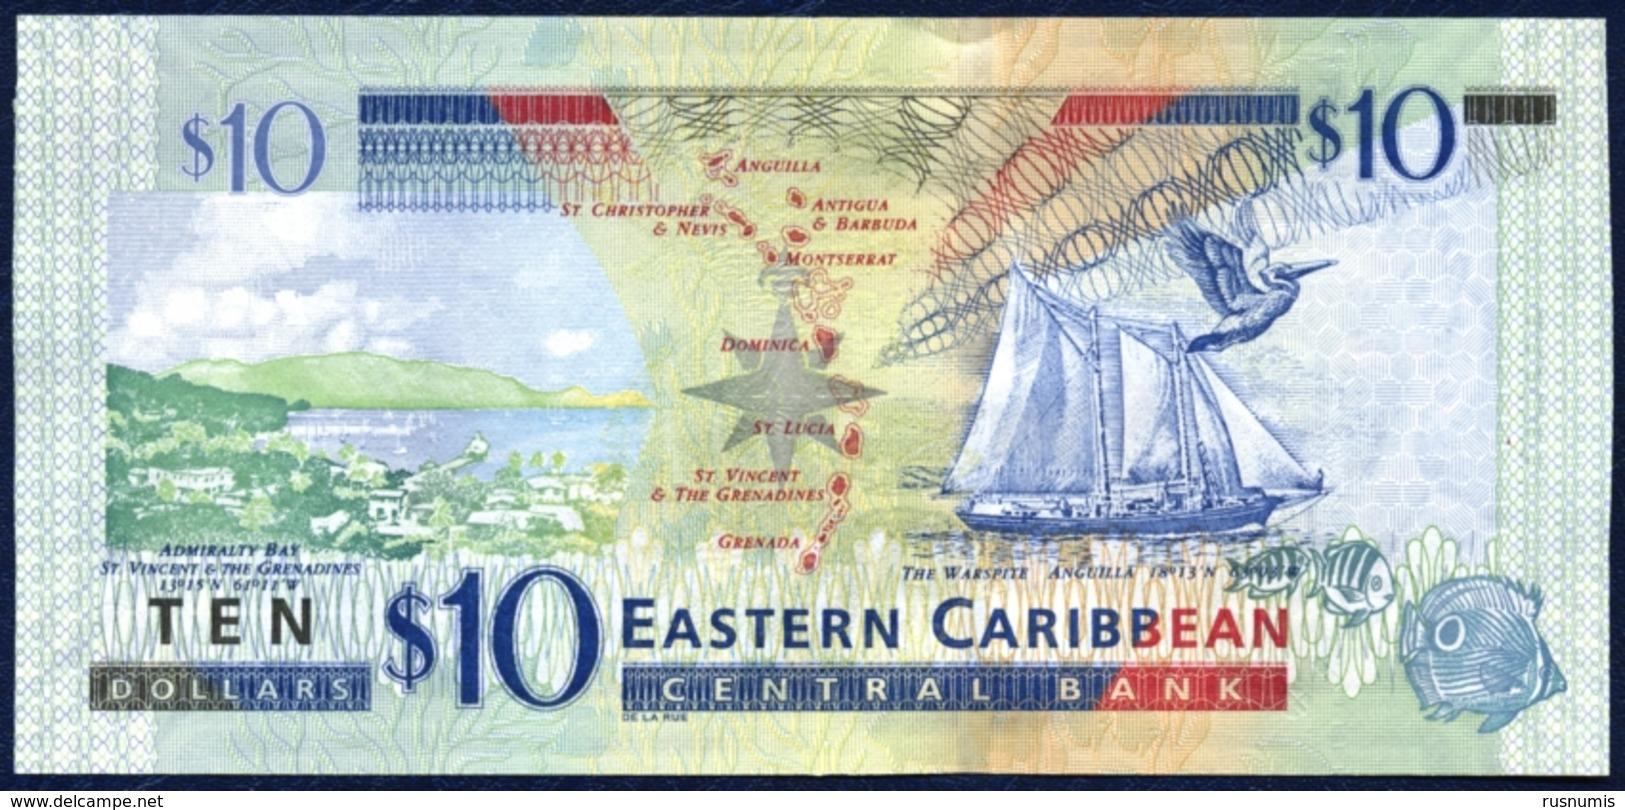 "EASTERN CARIBBEAN 10 DOLLARS P-52b Queen Elizabeth II Admiralty Bay (St. Vincent), Ship ""Warspite"" (Anguilla) 2012 UNC - Caraïbes Orientales"